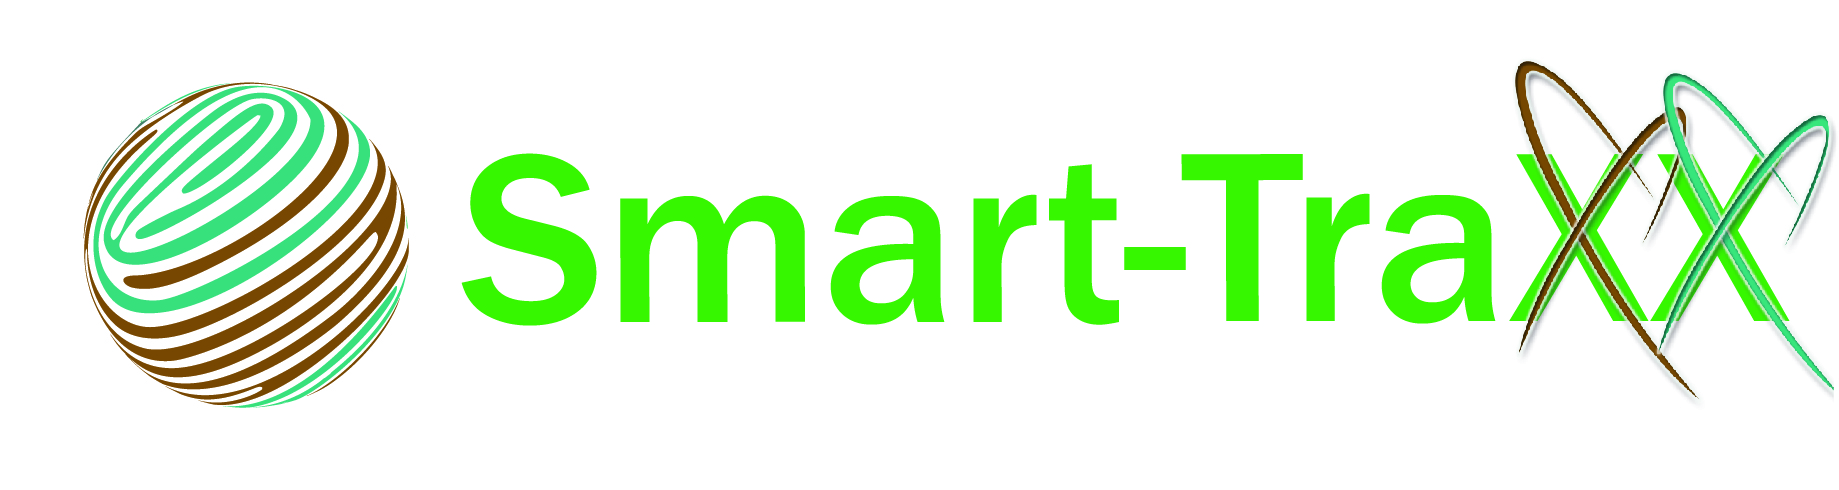 Smart-TraXX logo